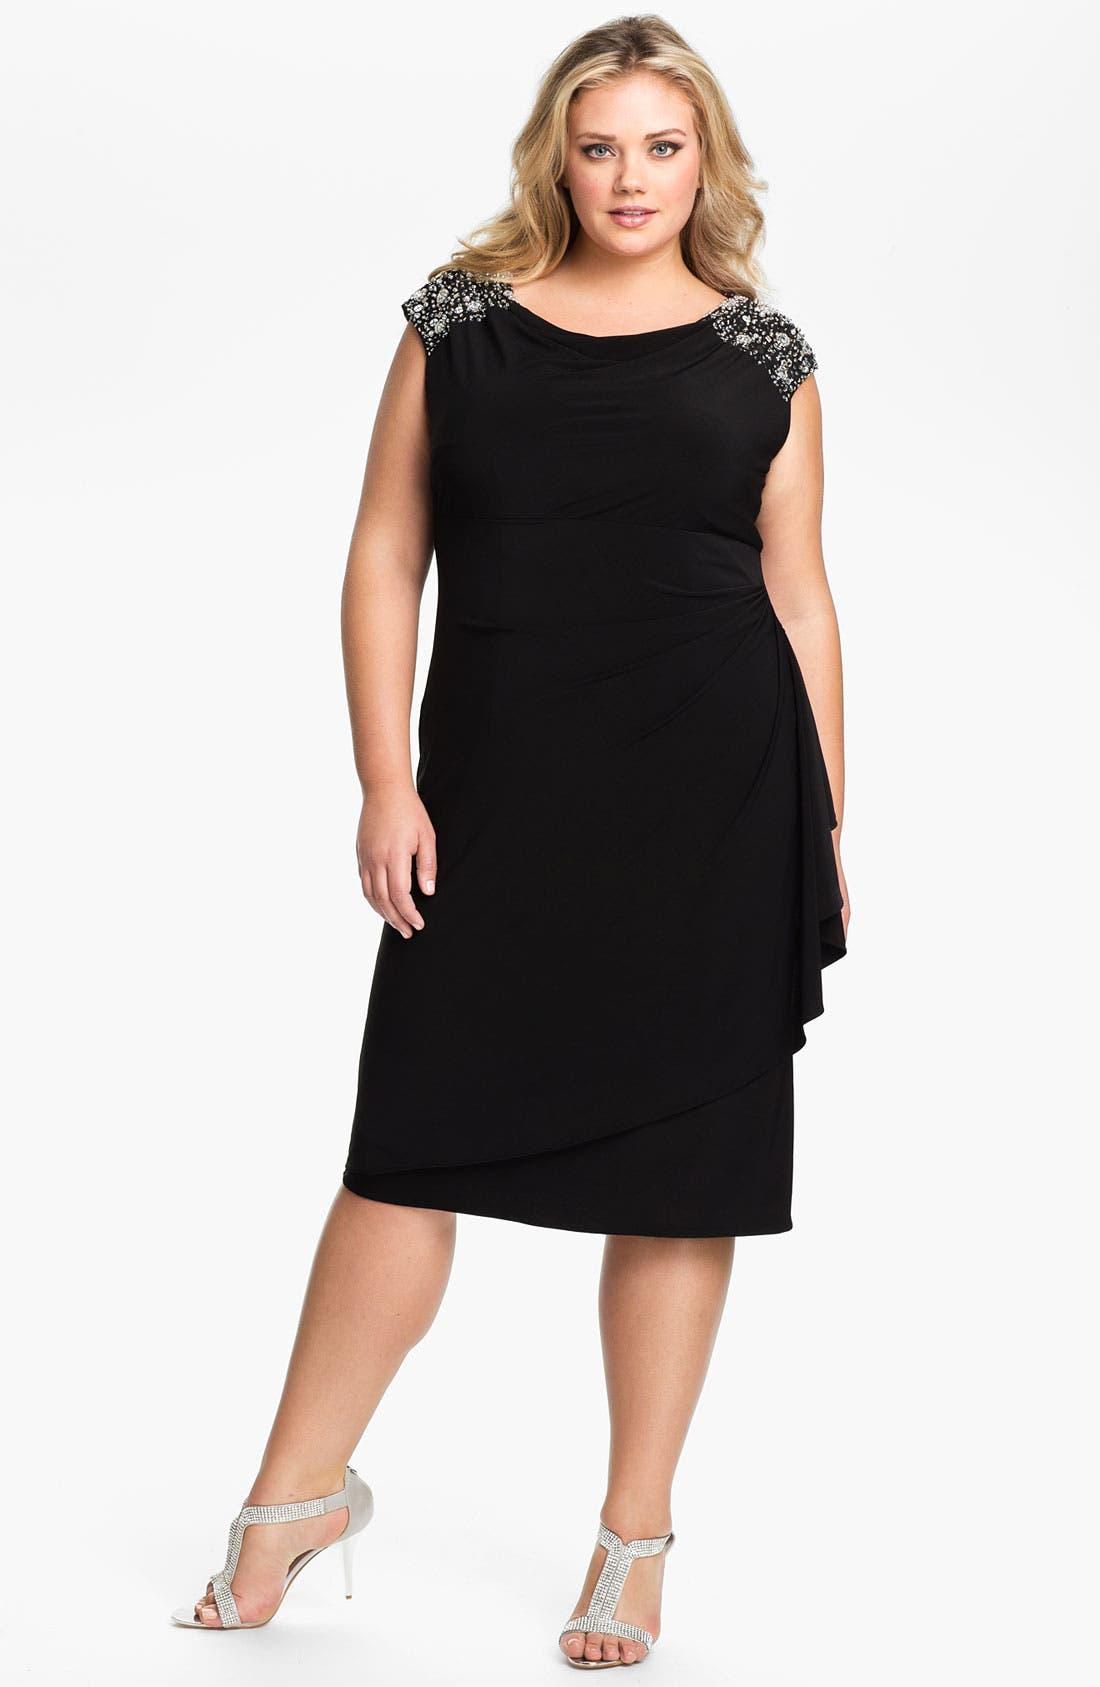 Alternate Image 1 Selected - Alex Evenings Beaded Shoulder Faux Wrap Jersey Dress (Plus Size)